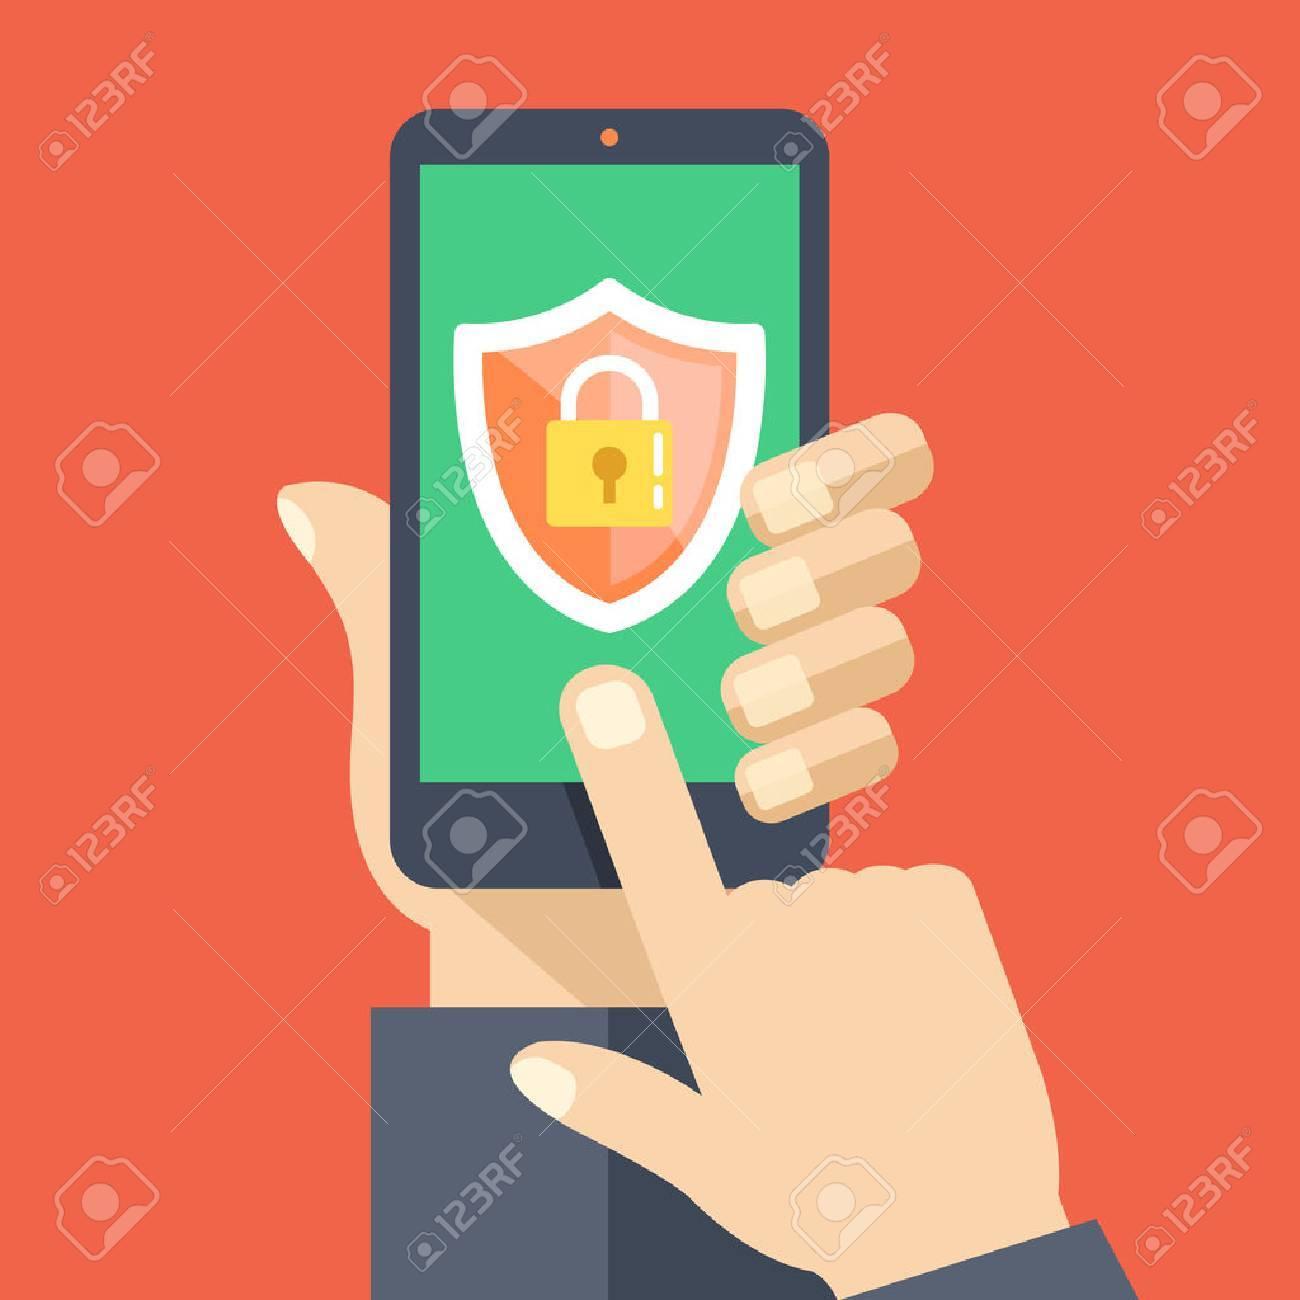 Mobile security app on smartphone screen. Flat design vector illustration - 50916251